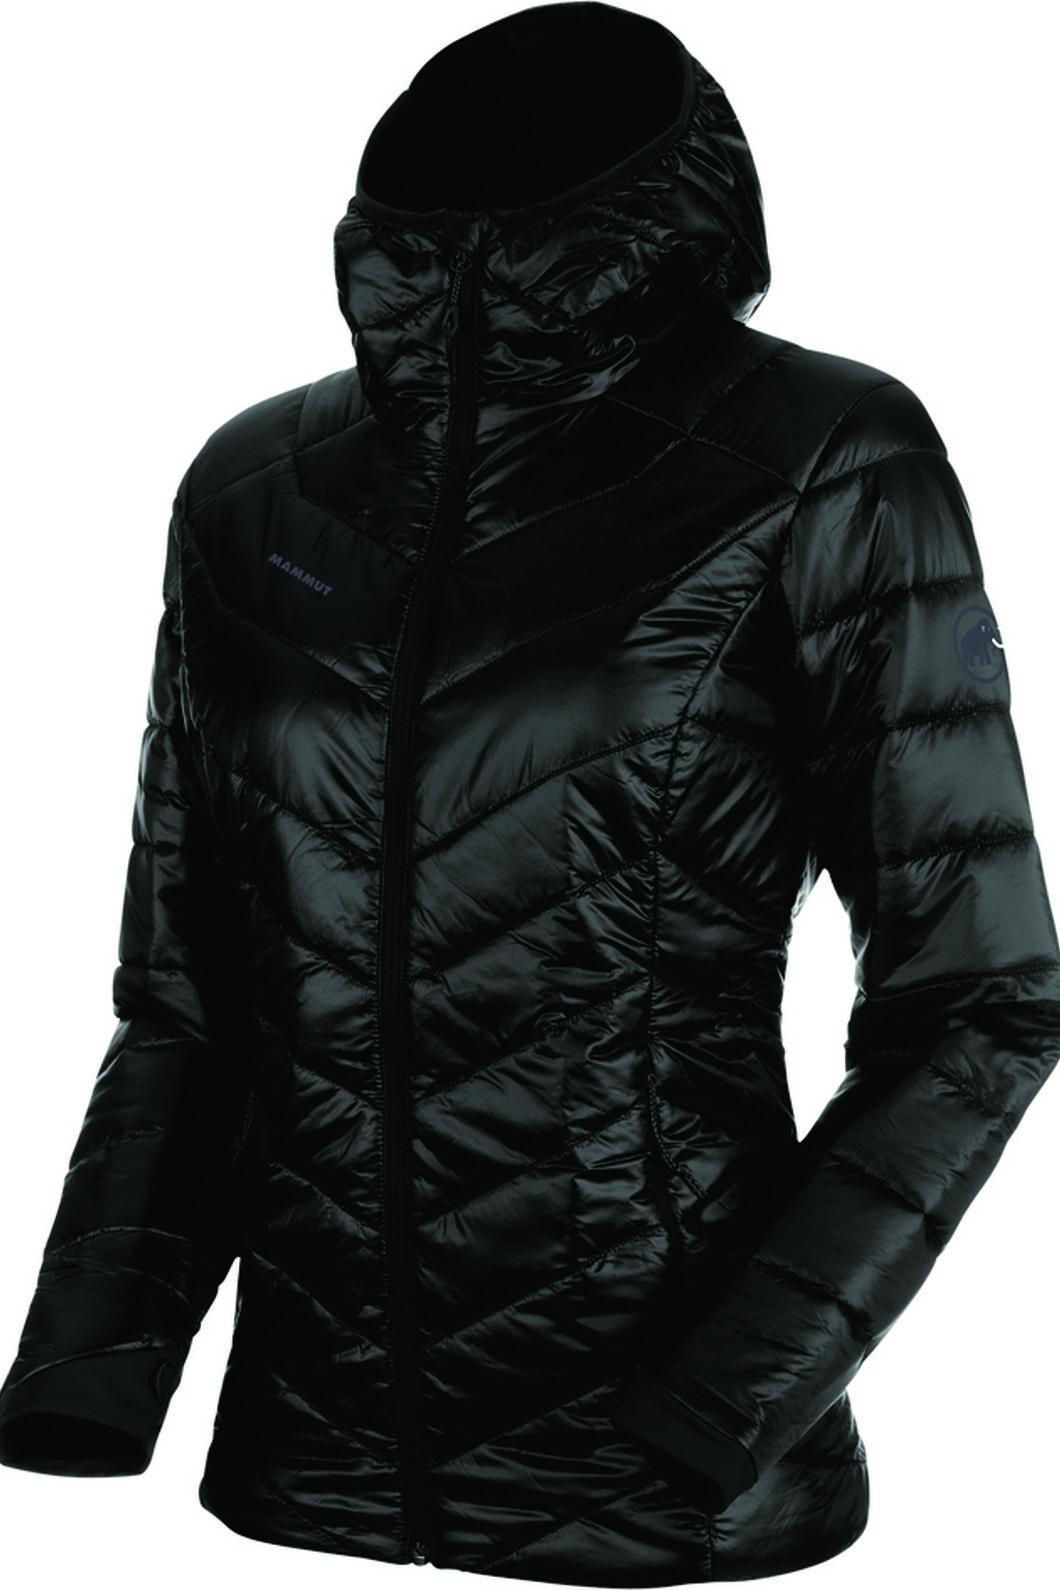 Mammut Rime Hooded Insulation Jacket - Women's, Black, hi-res